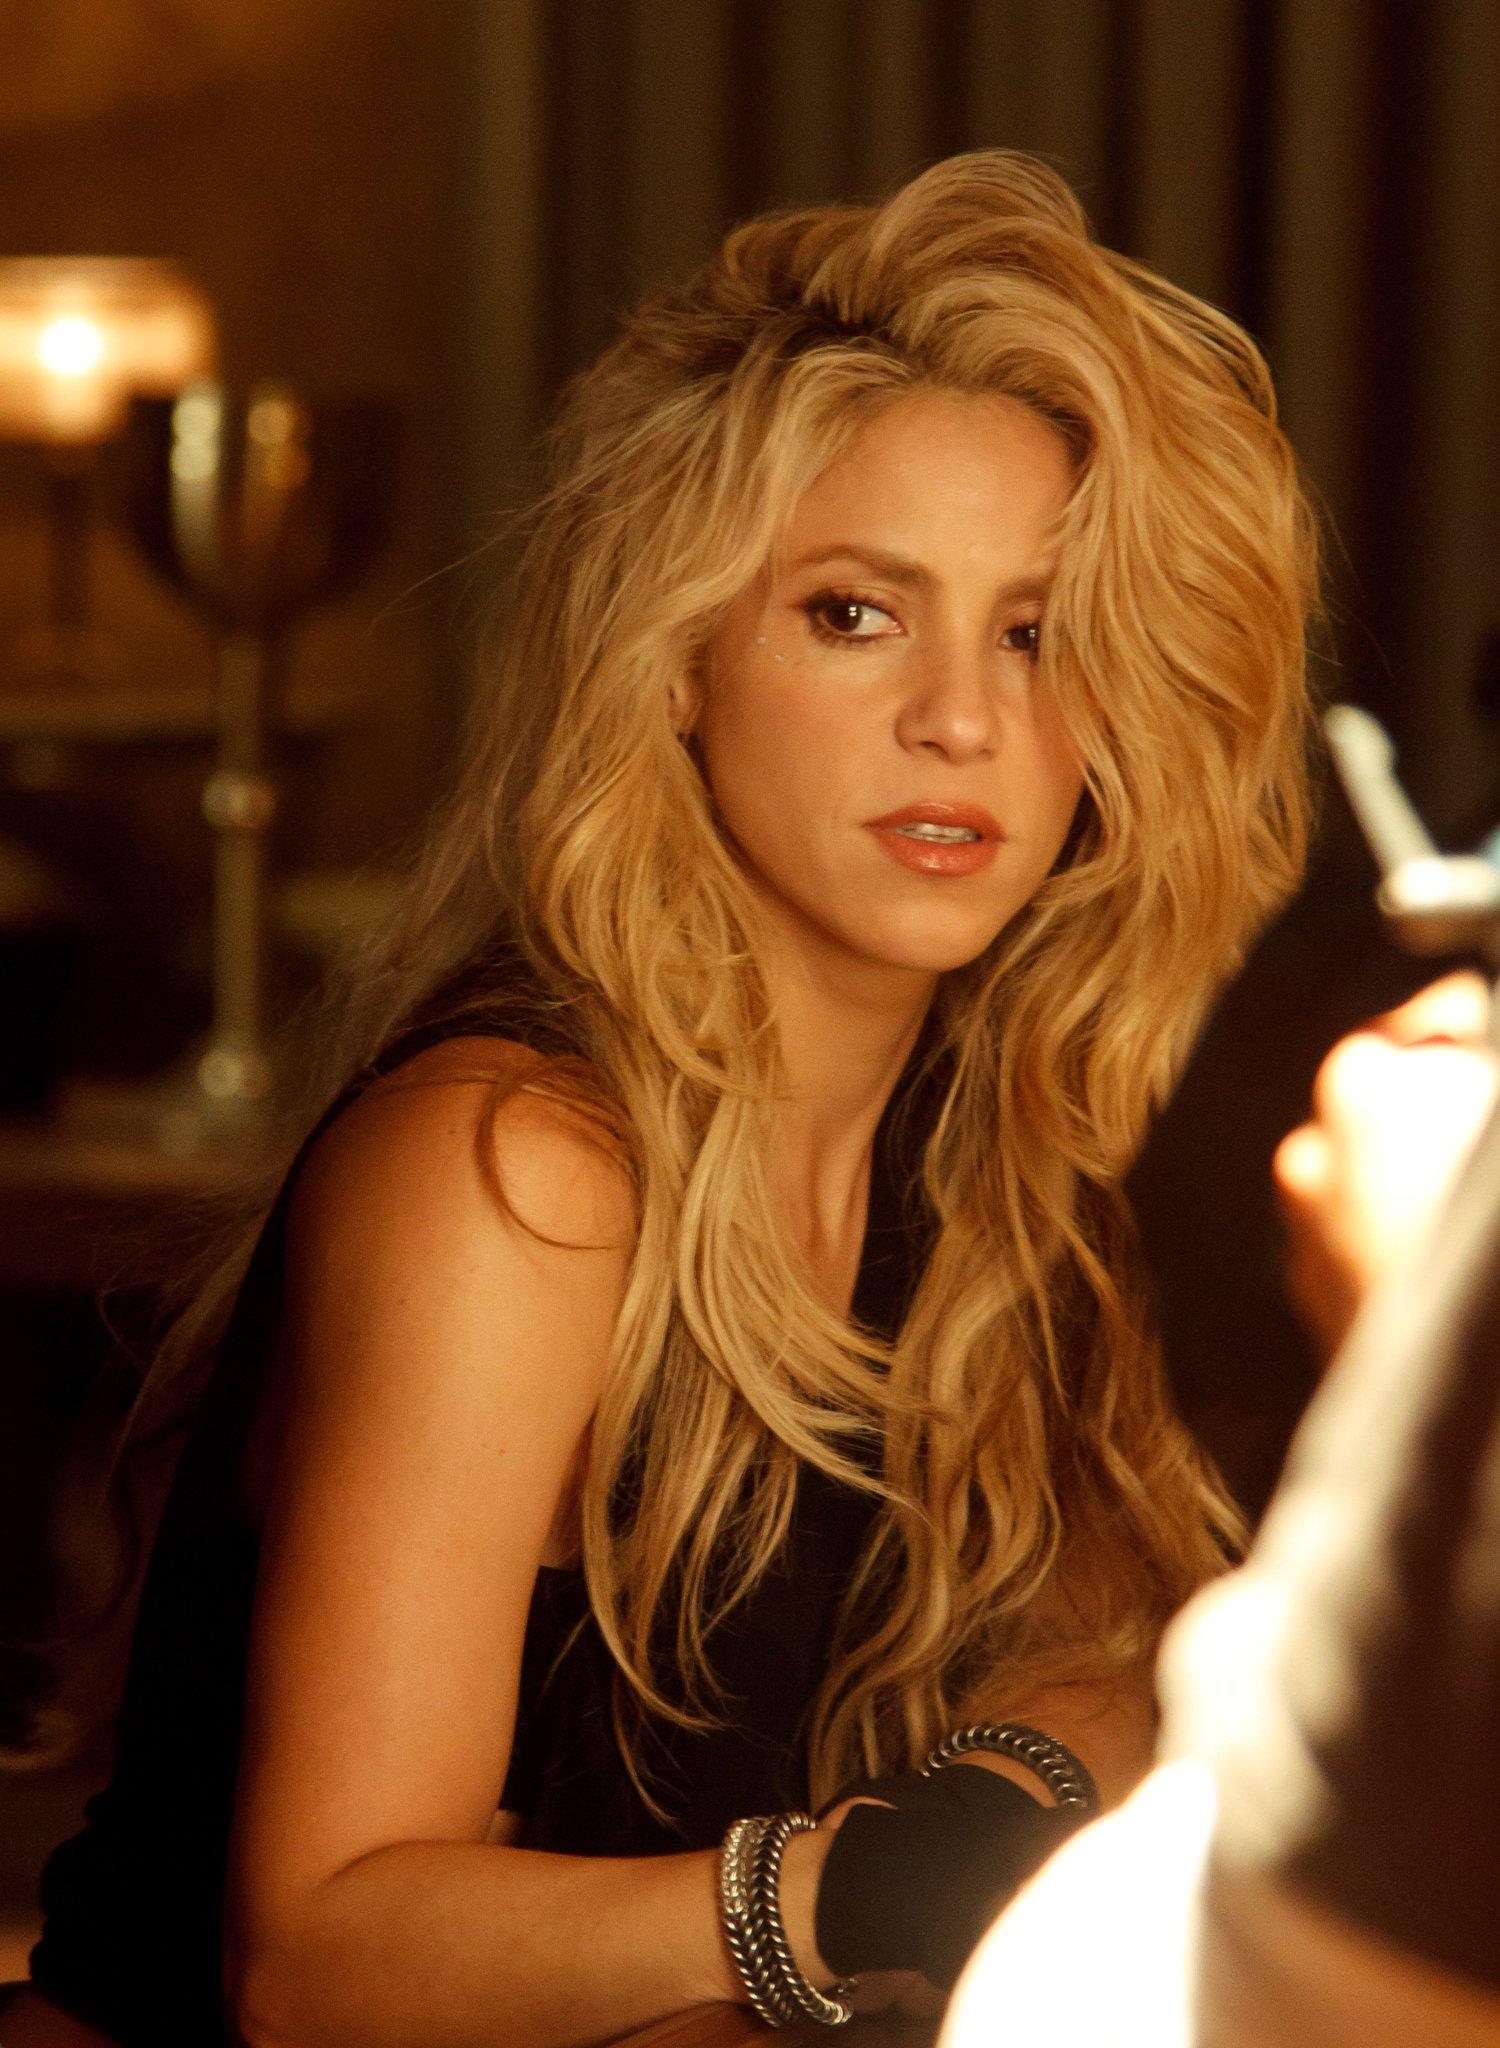 Shakira On Twitter Heres Shakira At The Bar On The